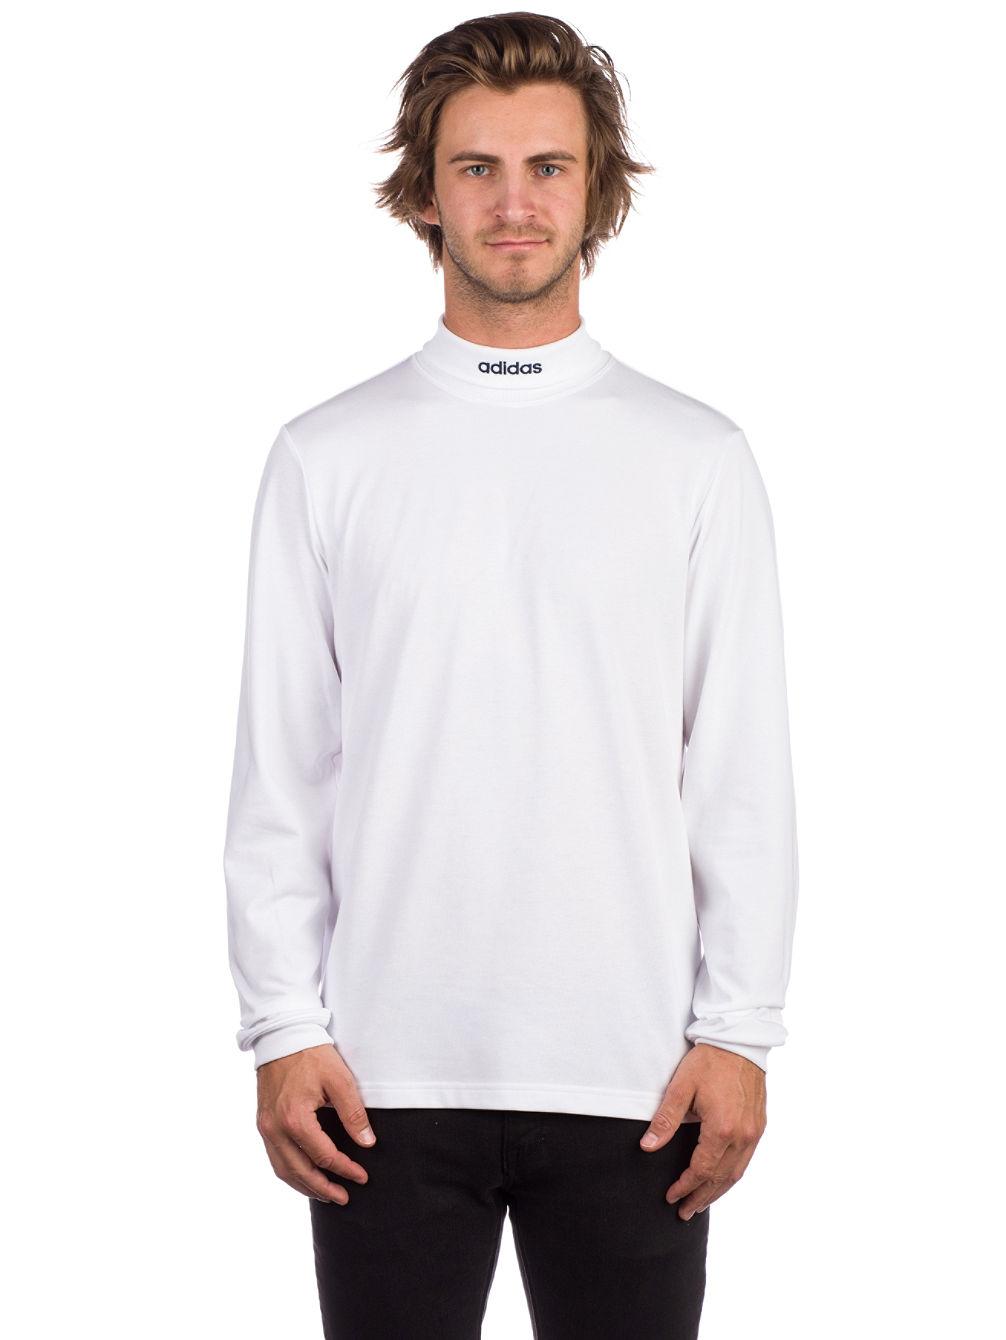 adidas skateboarding hi collar t shirt online kaufen bei. Black Bedroom Furniture Sets. Home Design Ideas